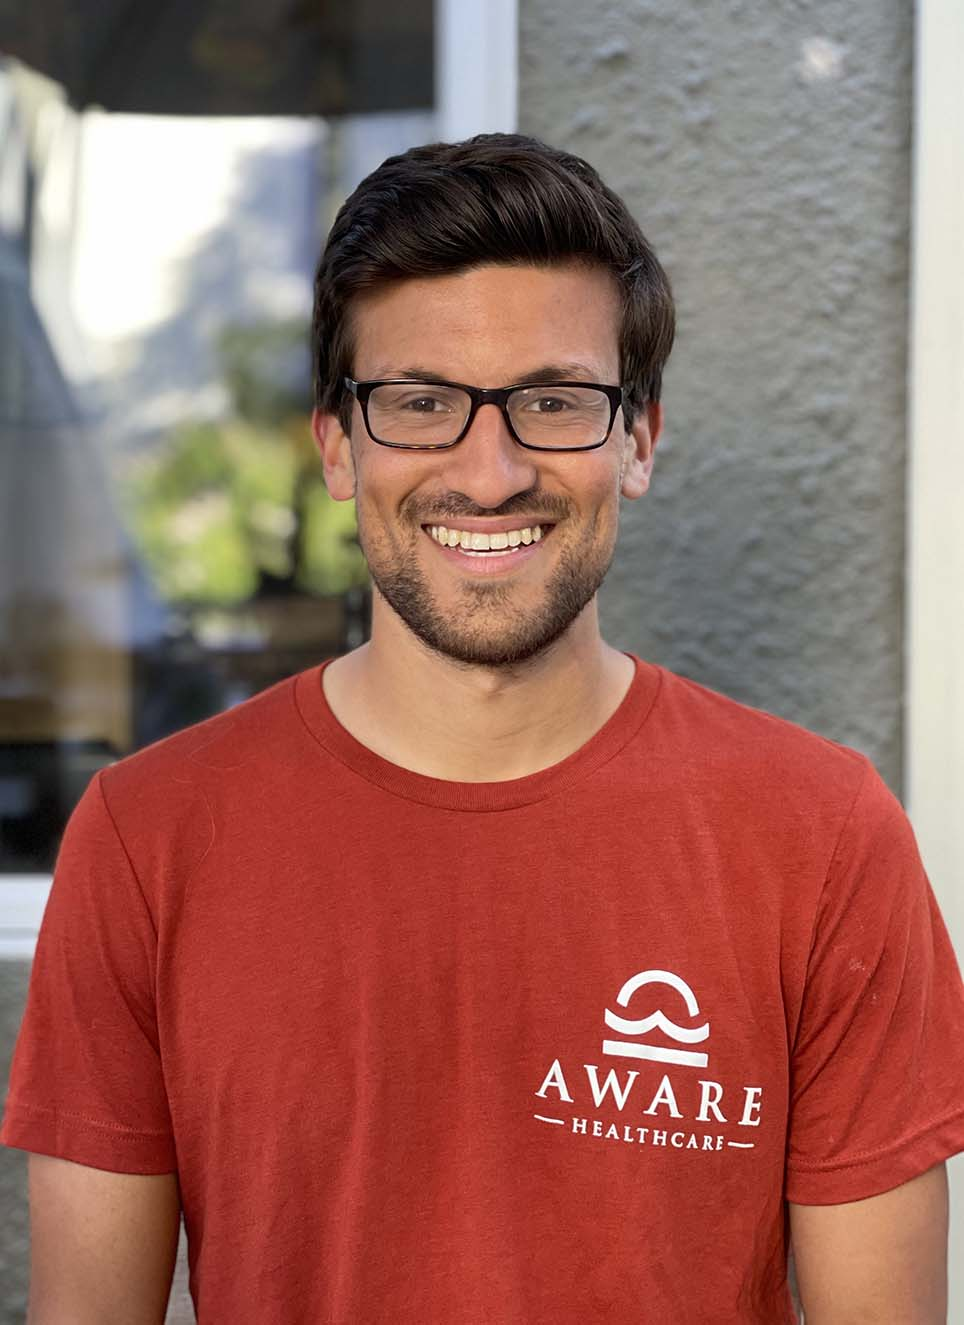 Image of AJ goldstein founder of aware